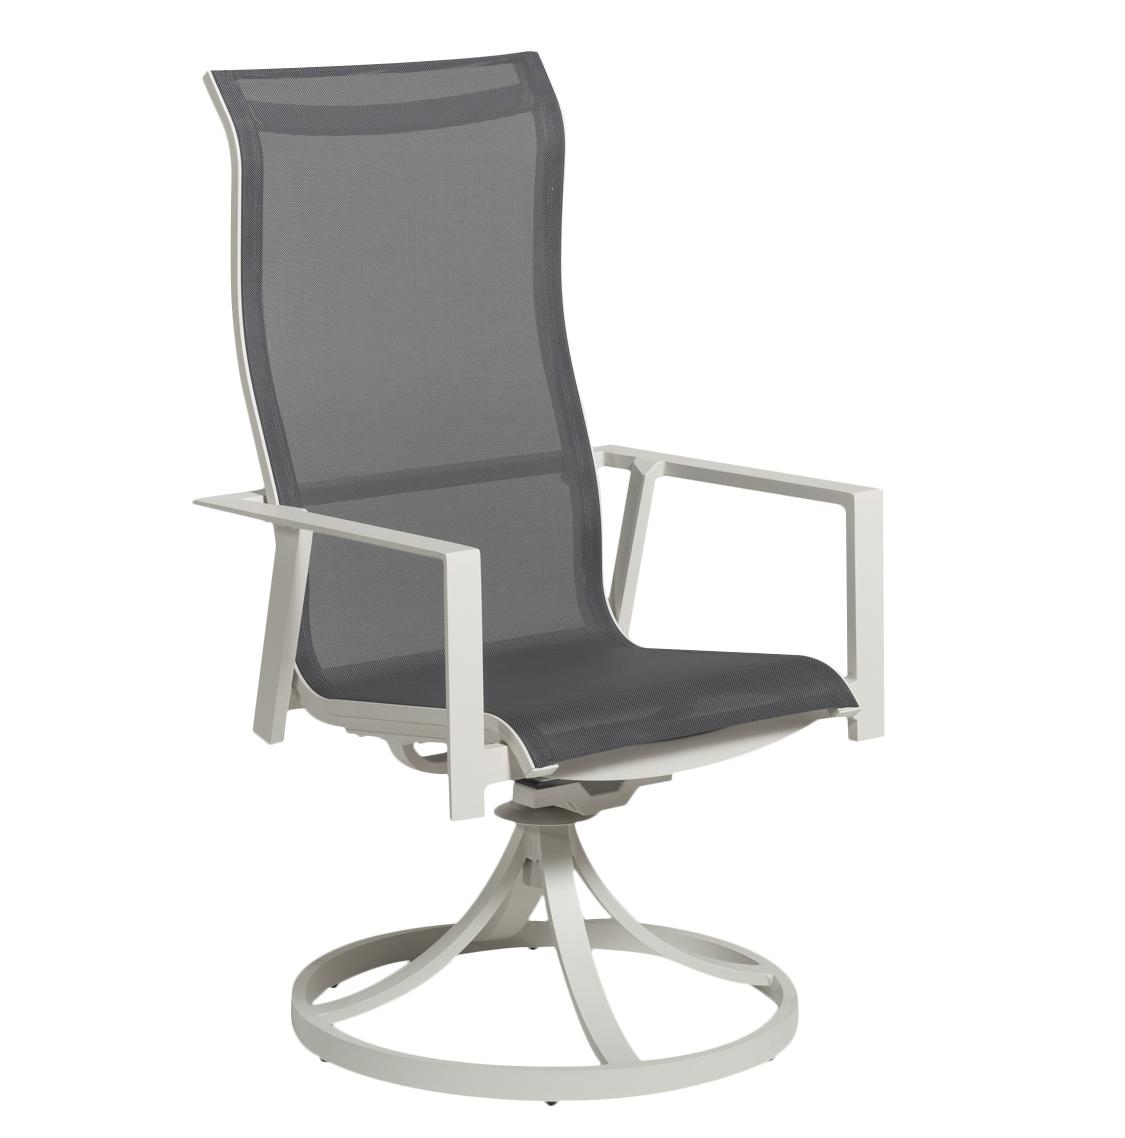 Solana Sling Swivel Rocking Dining Chair